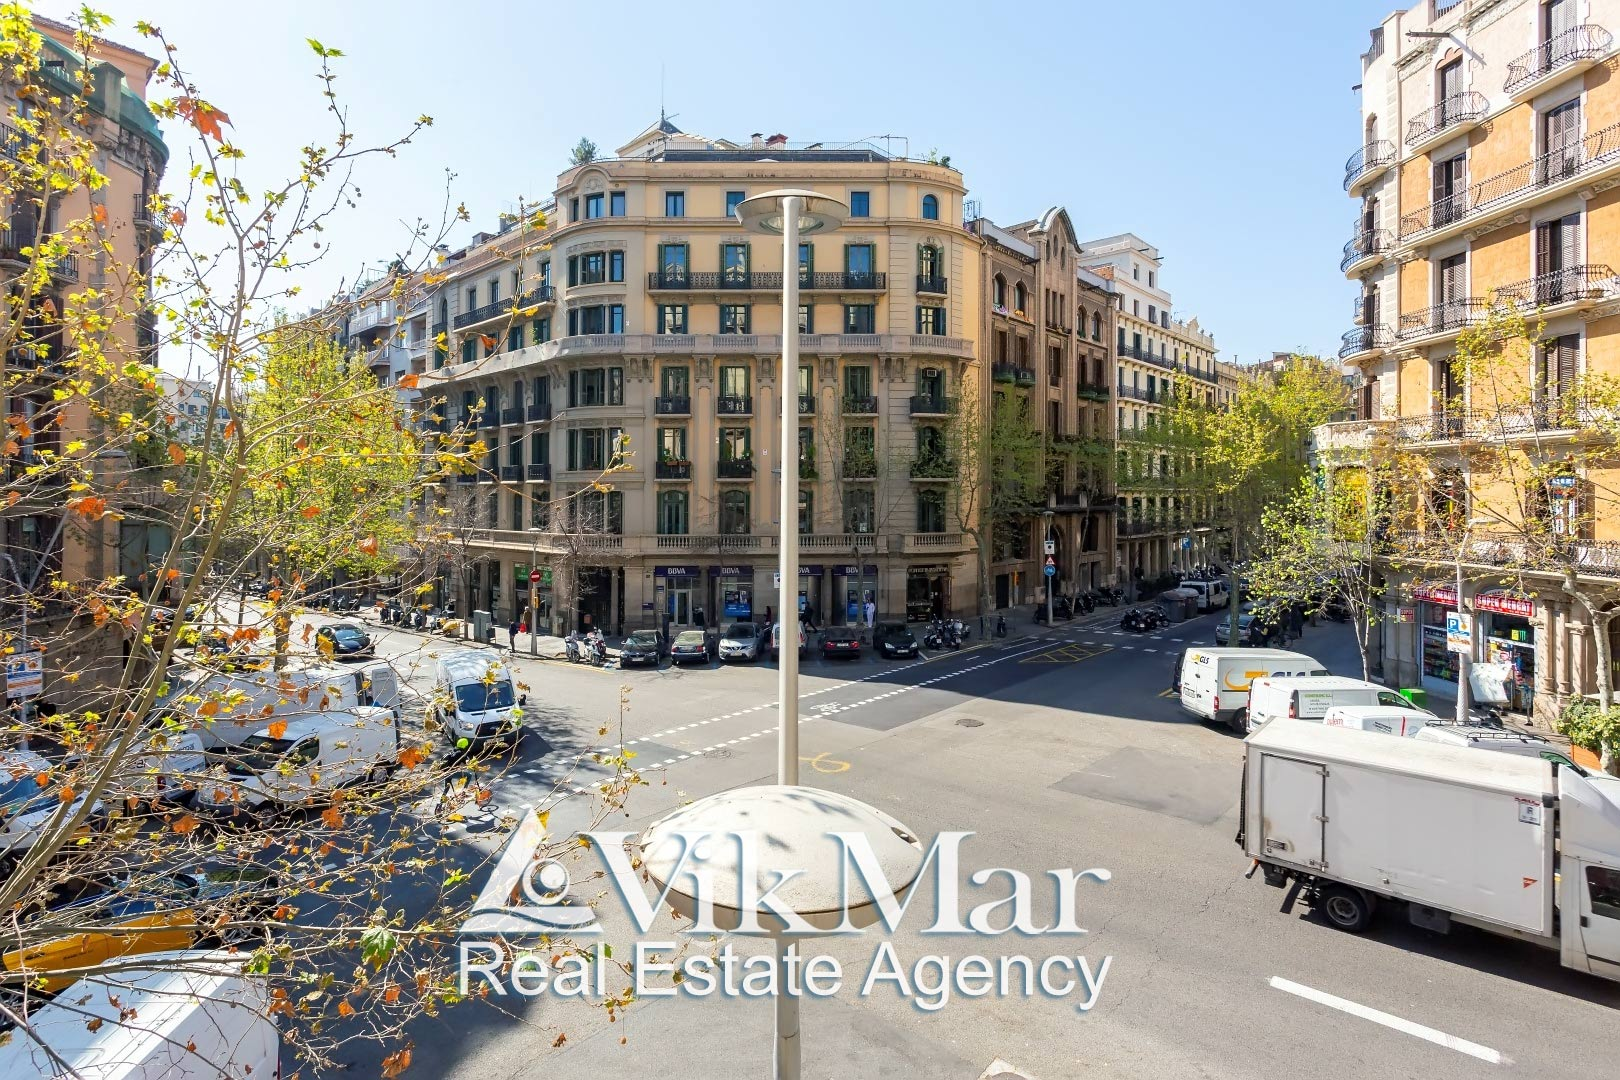 Prodazha kvartiry v istoricheskom tsentre Barselony na ulitse Carrer de Roger de Llúria - N1852 - vikmar-realty.ru